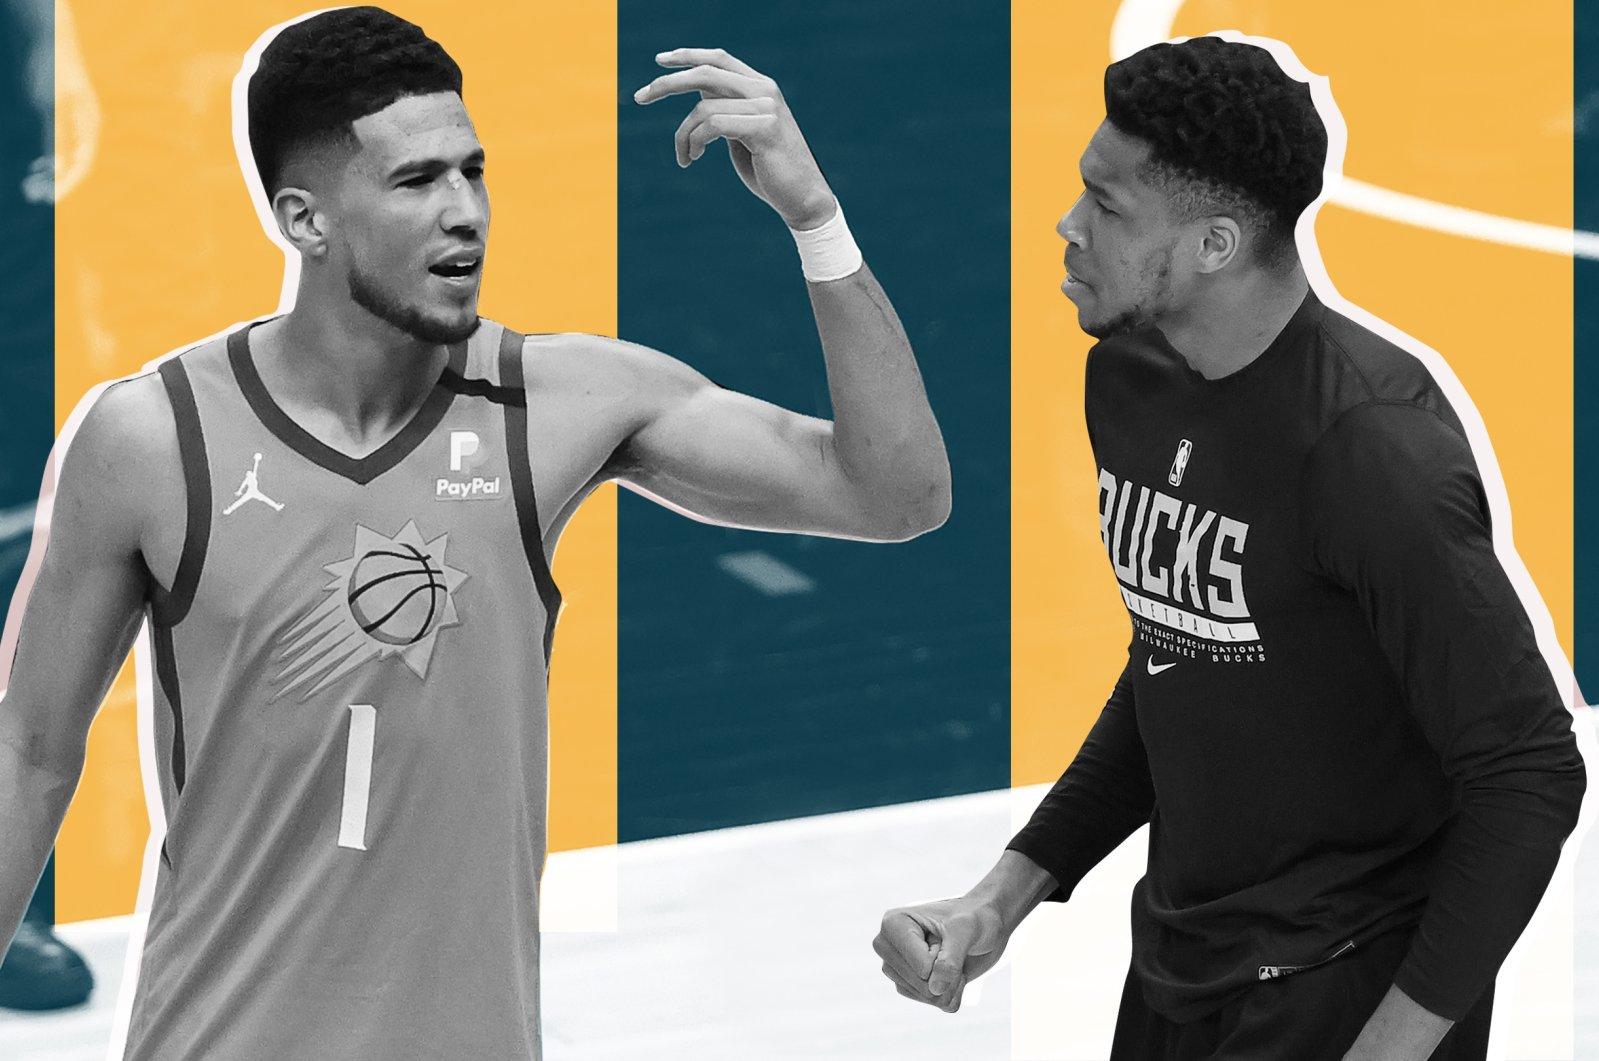 This photo combo created on July 5, 2021, shows Phoenix Suns' Devin Booker and Milwaukee Bucks' Giannis Antetokounmpo. (Daily Sabah/Büşra Öztürk)